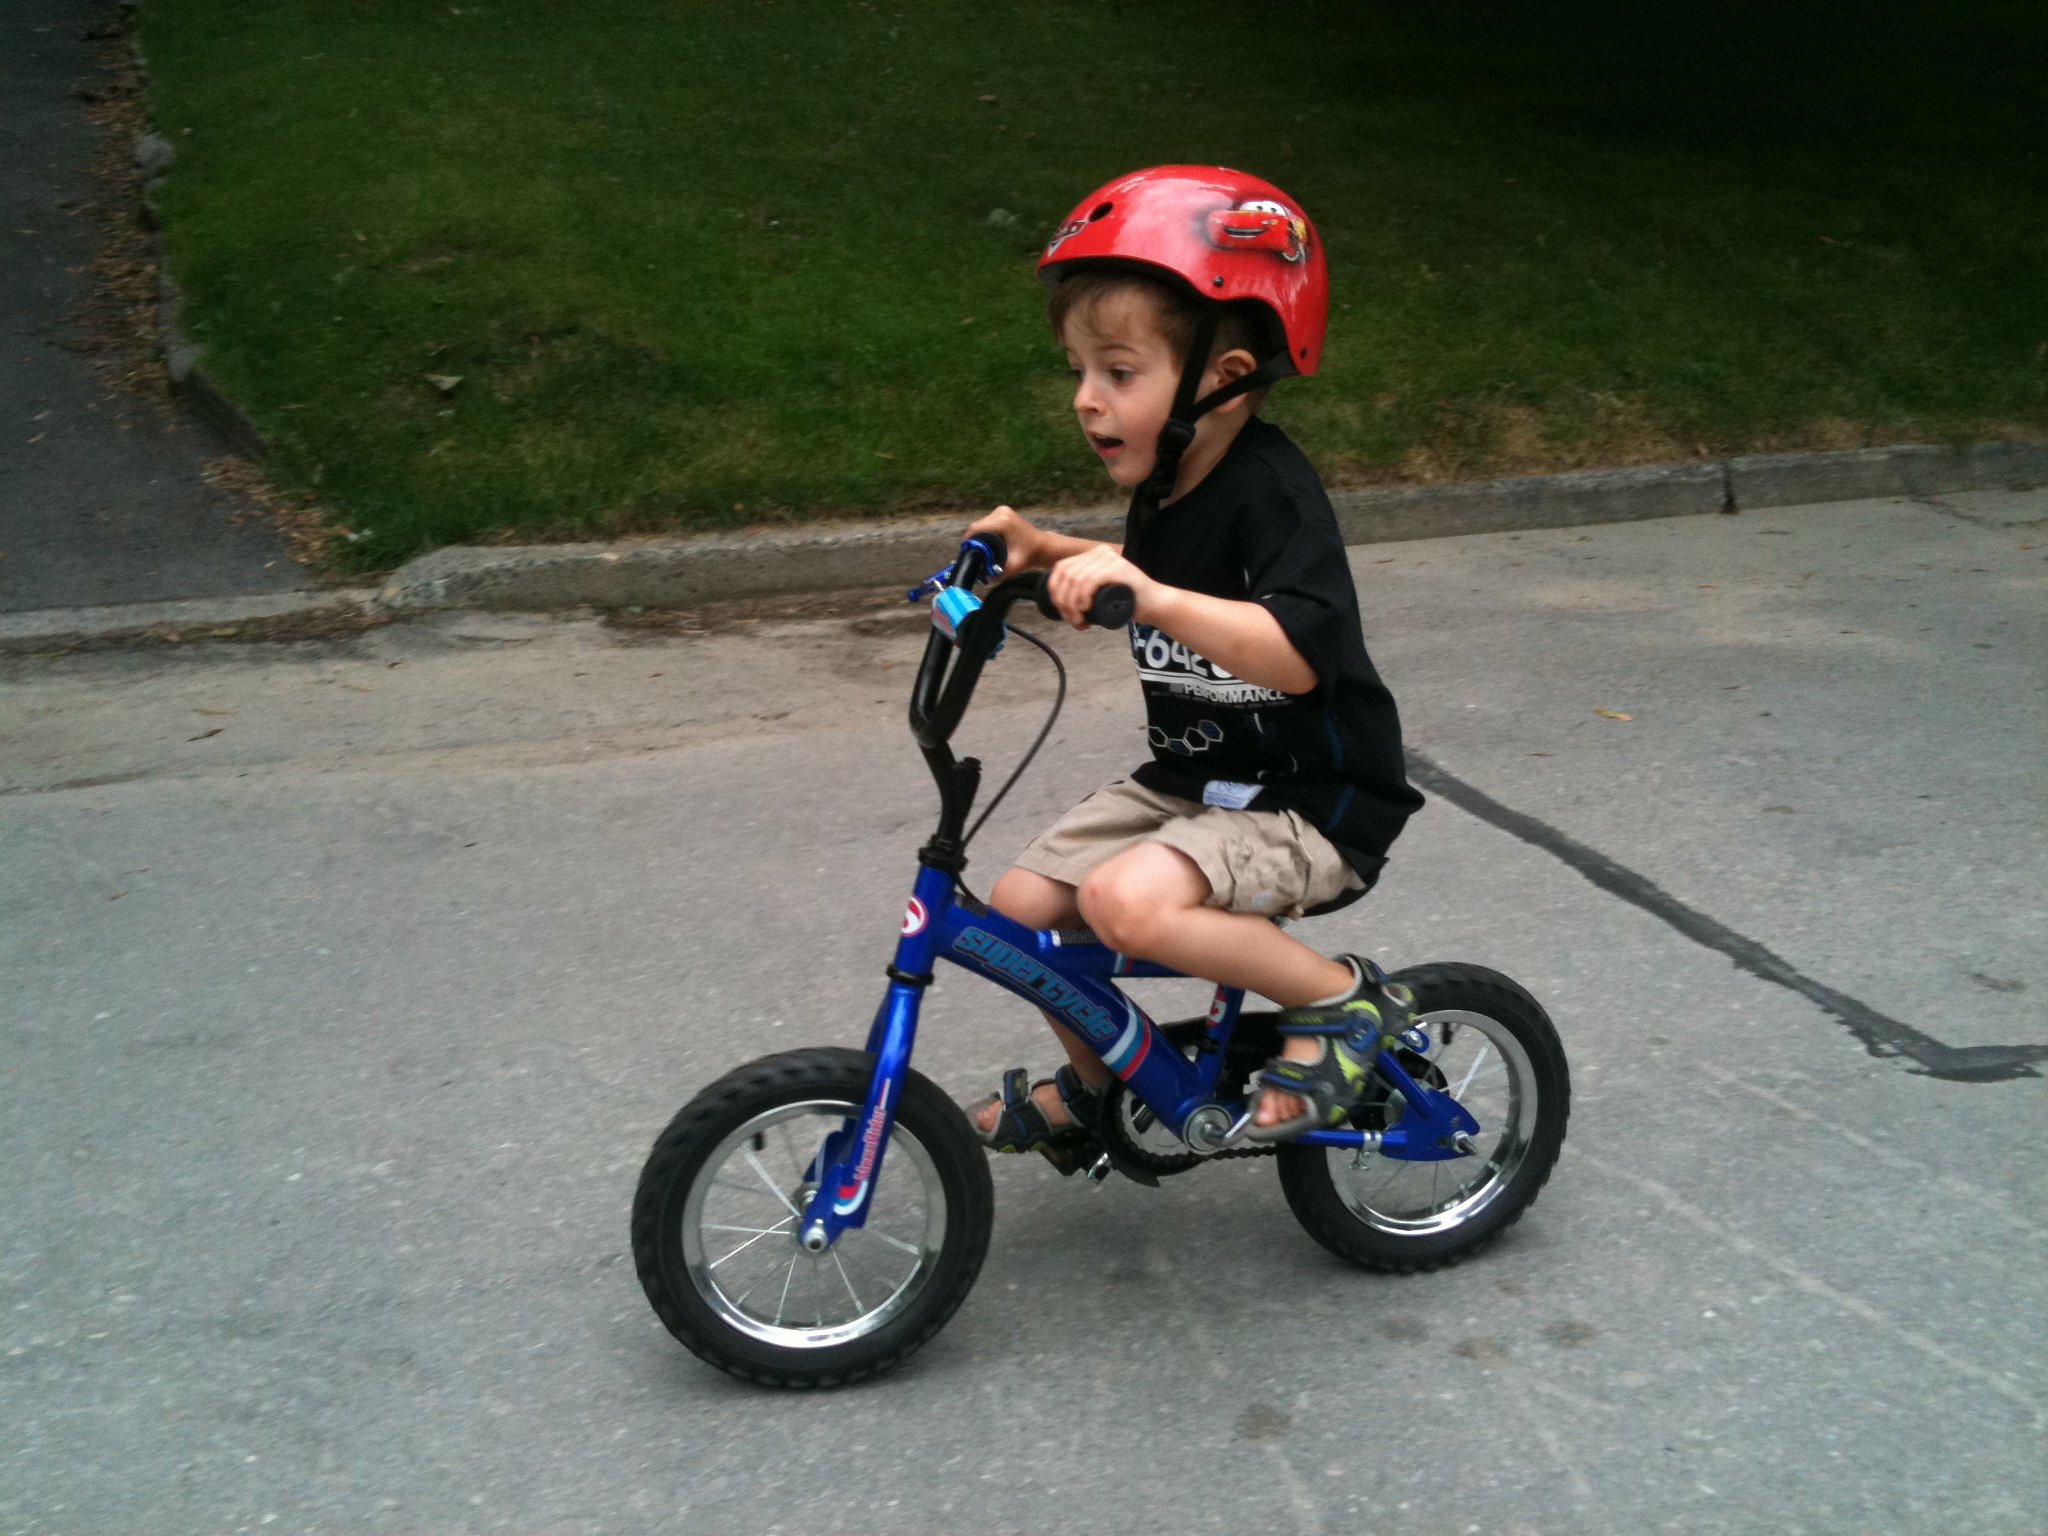 H riding a bike first time.jpg